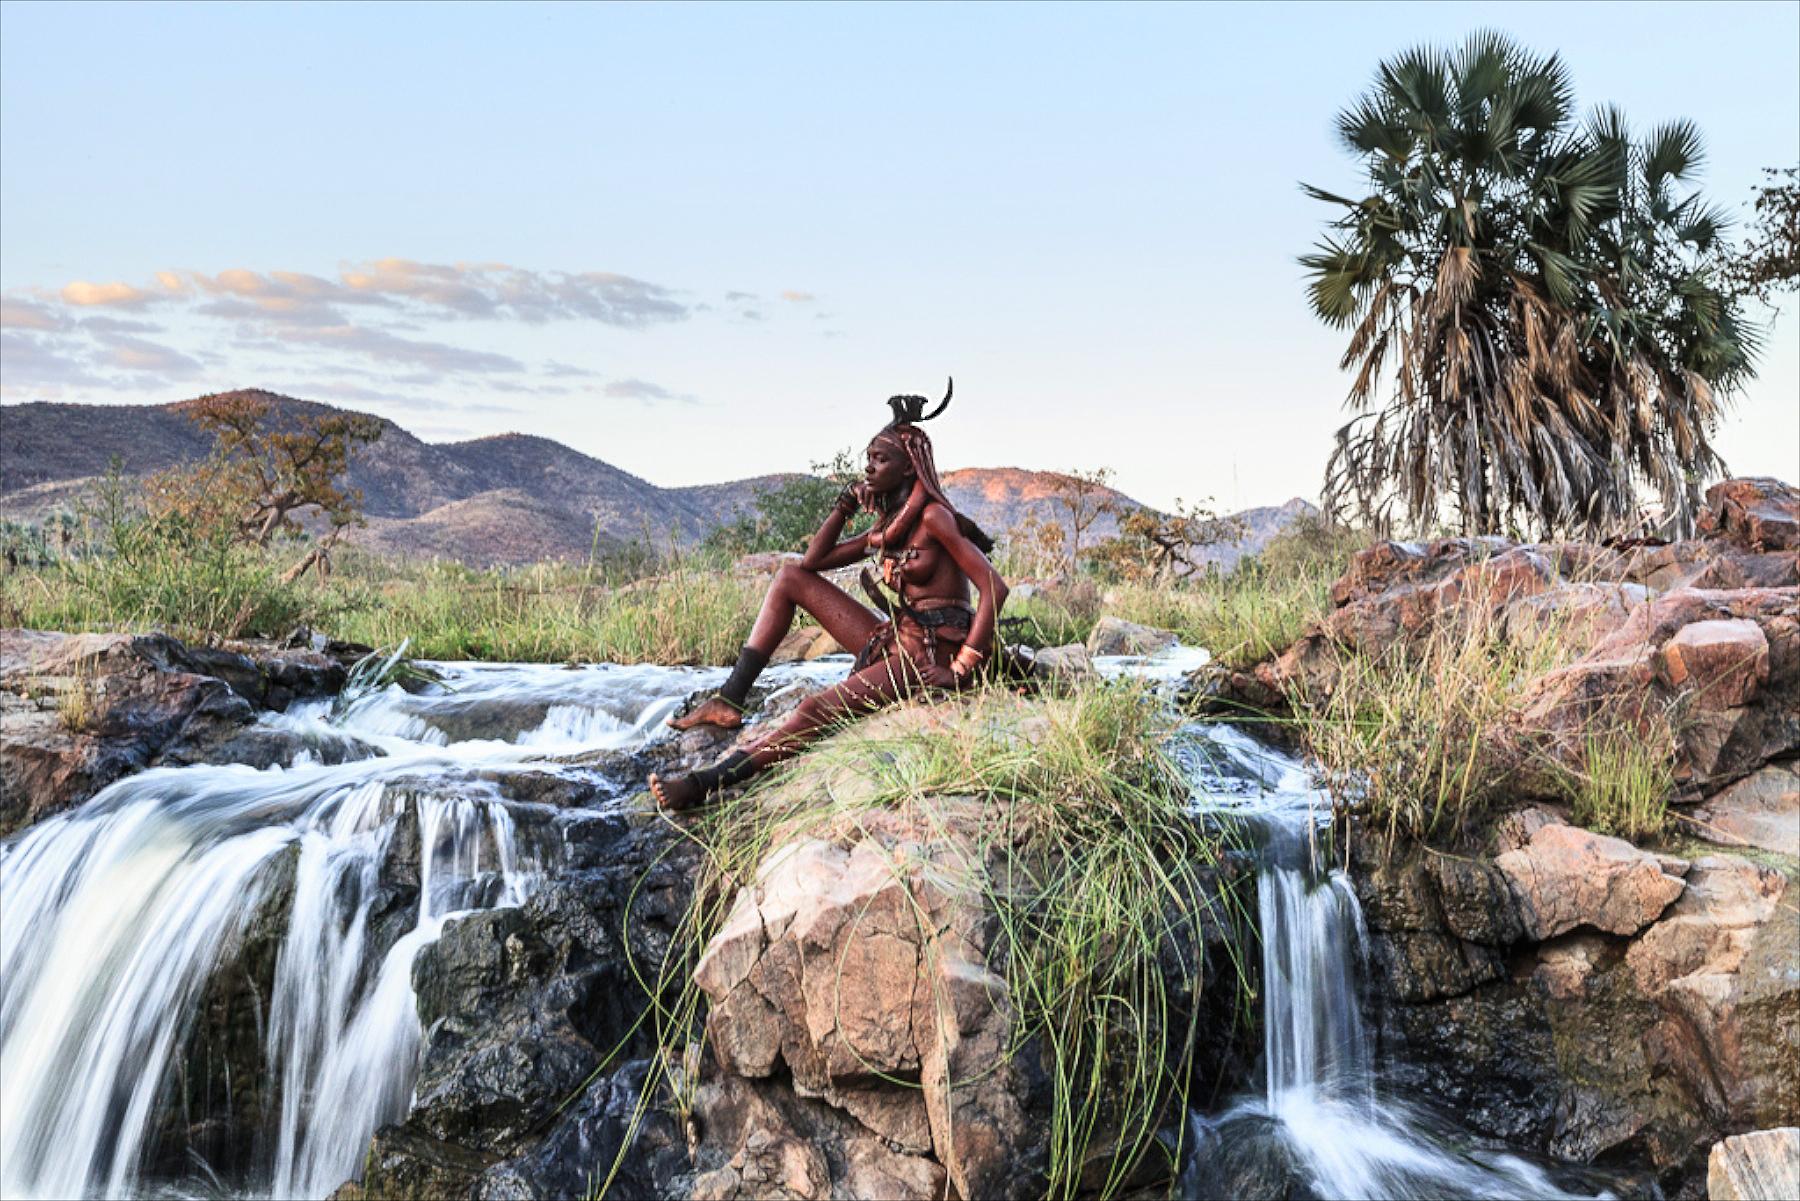 himba-woman-posing-namibia-alegra-ally